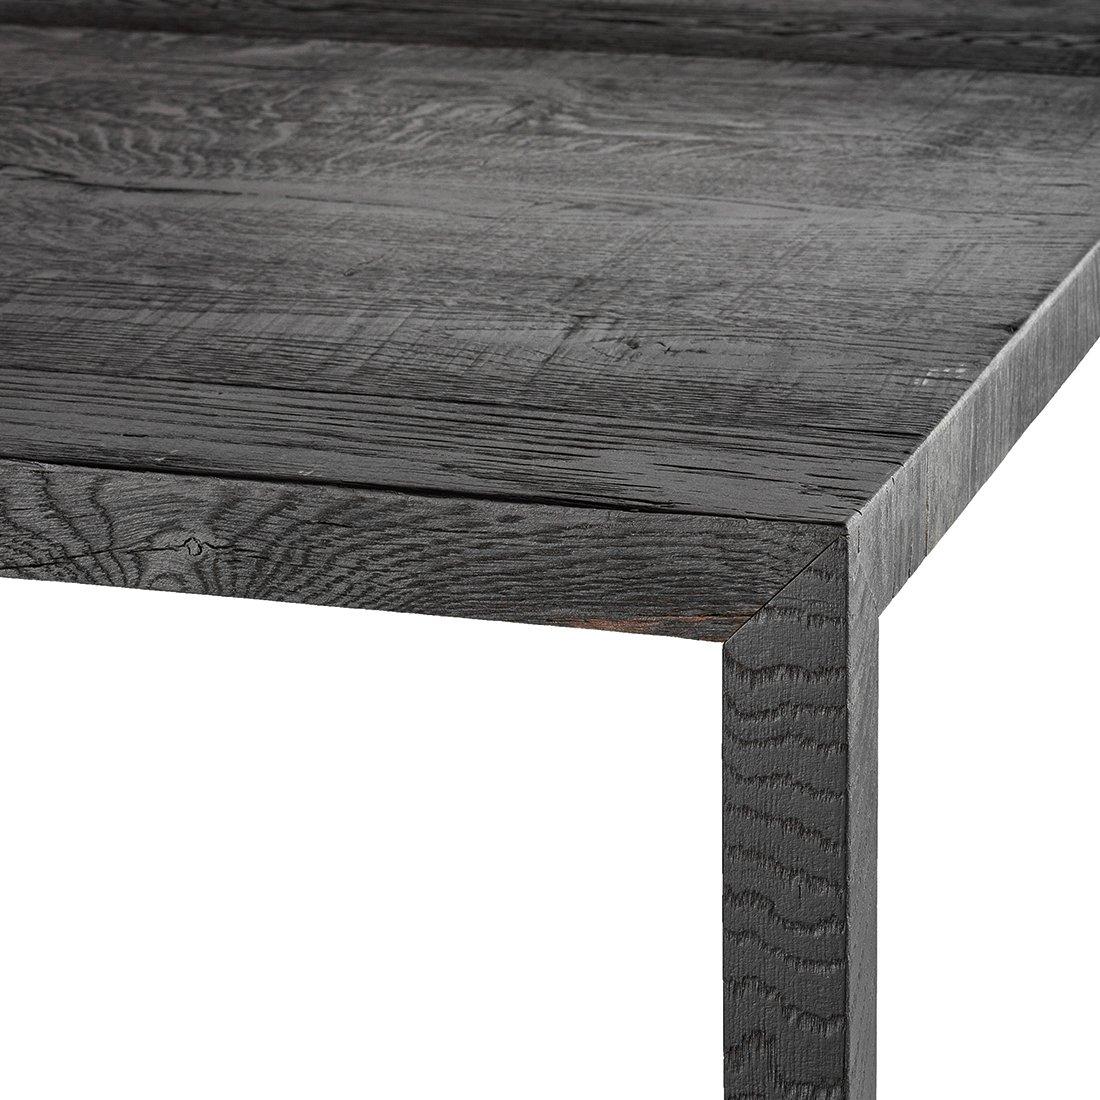 MDF Italia Tense Carbonised Wood Eettafel 400 x 120 cm.